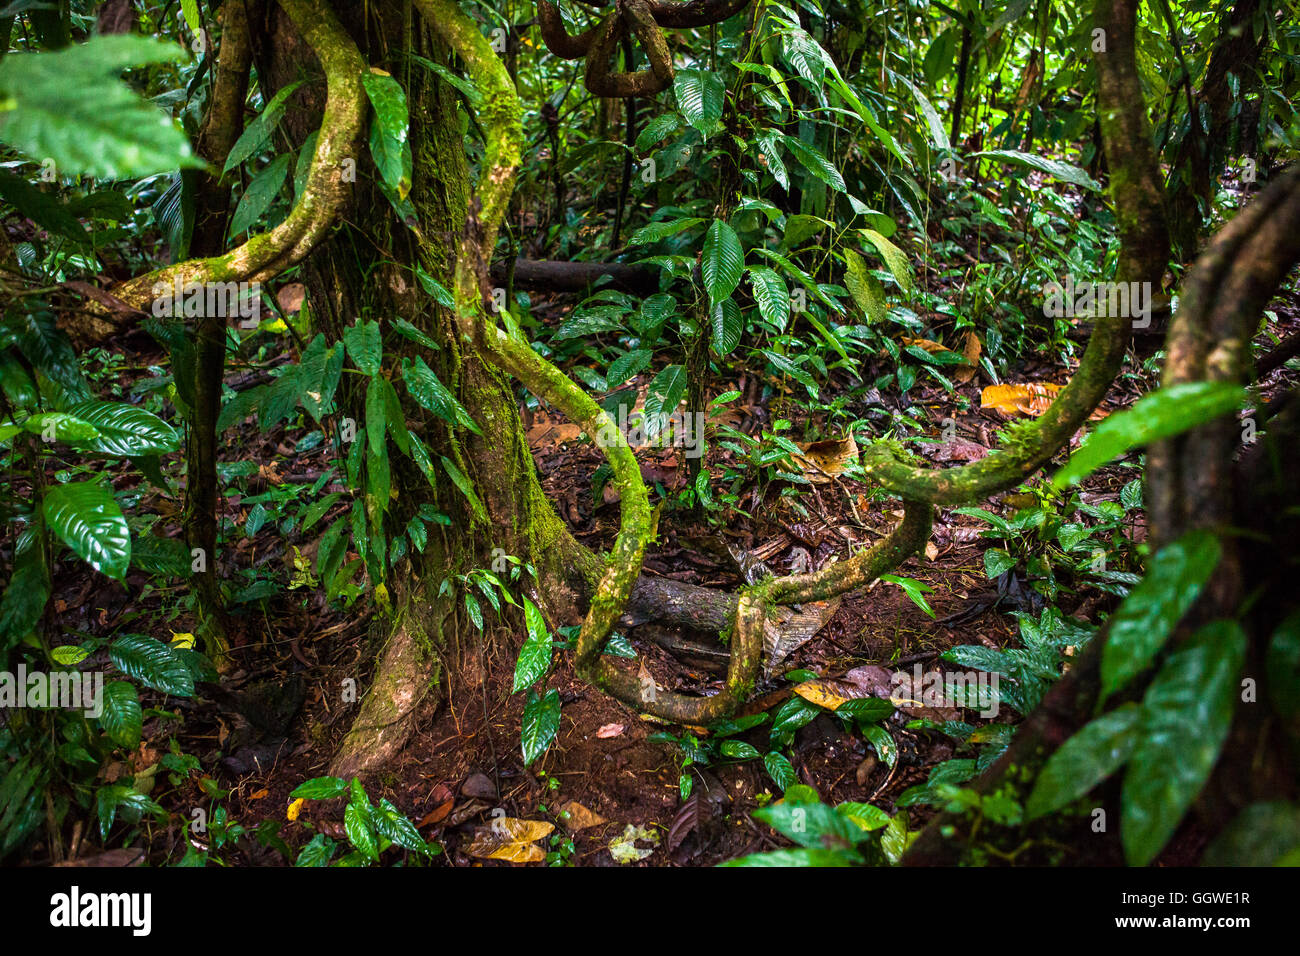 Stems and lianas in the Ecuadorian Amazon jungle - Stock Image